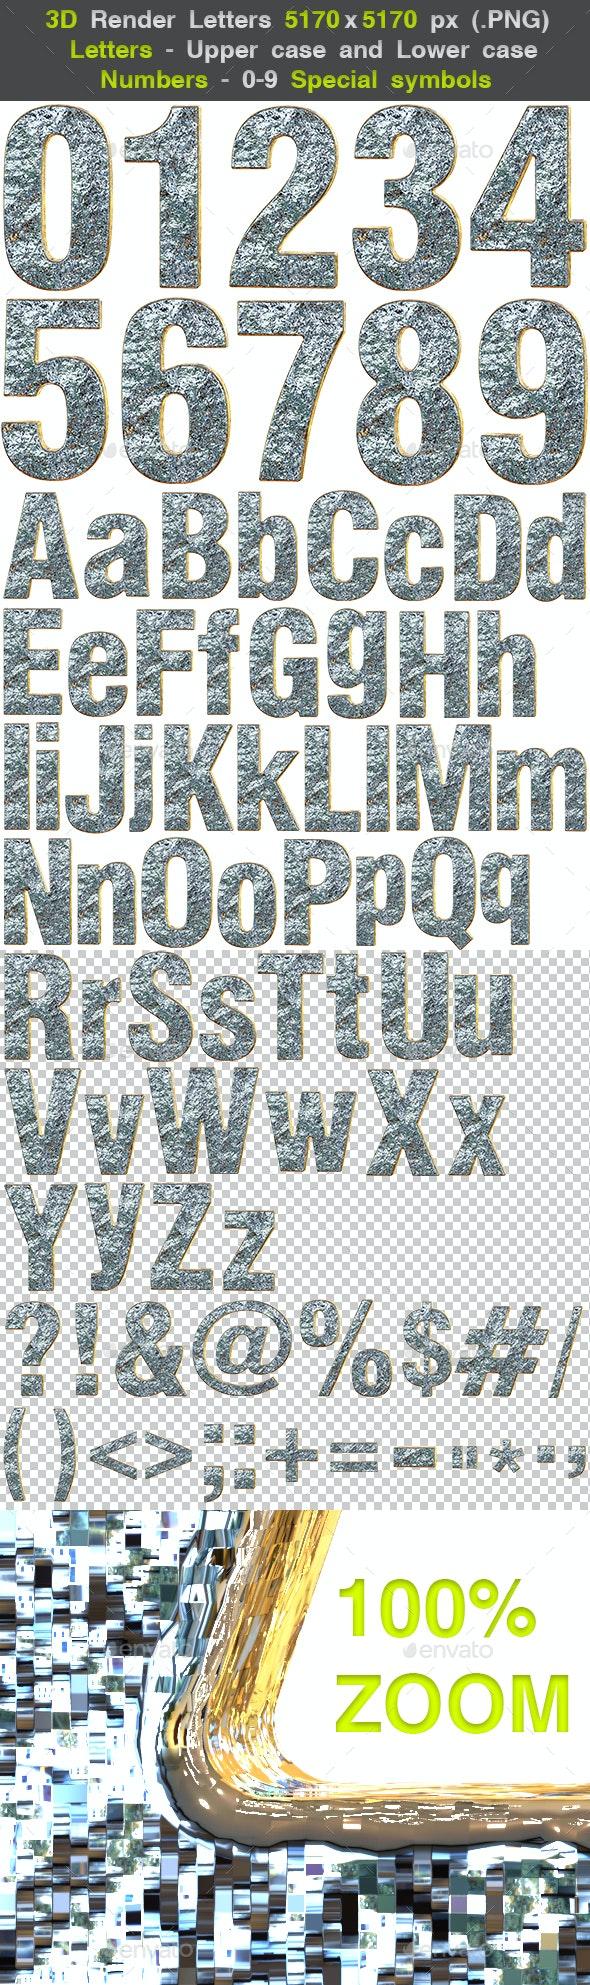 3D Render Silver Relief Metal Letters - Text 3D Renders